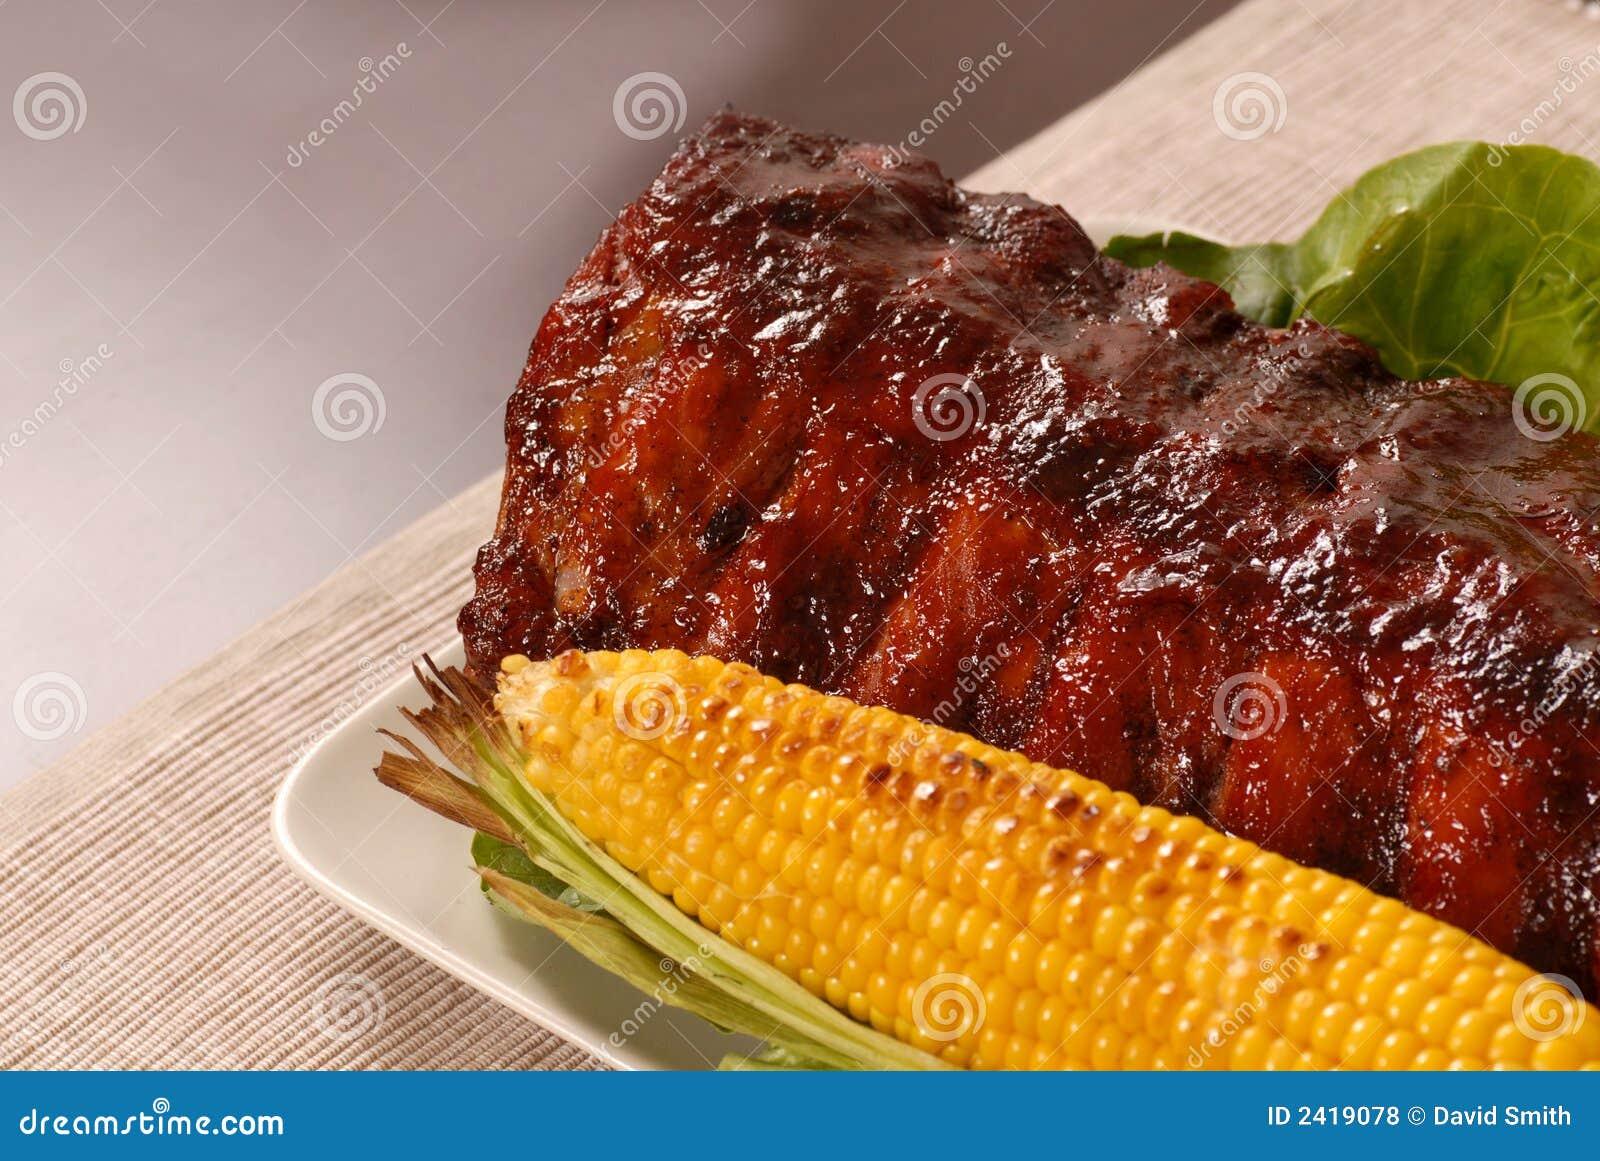 Brame des nervures et du maïs de barbecue